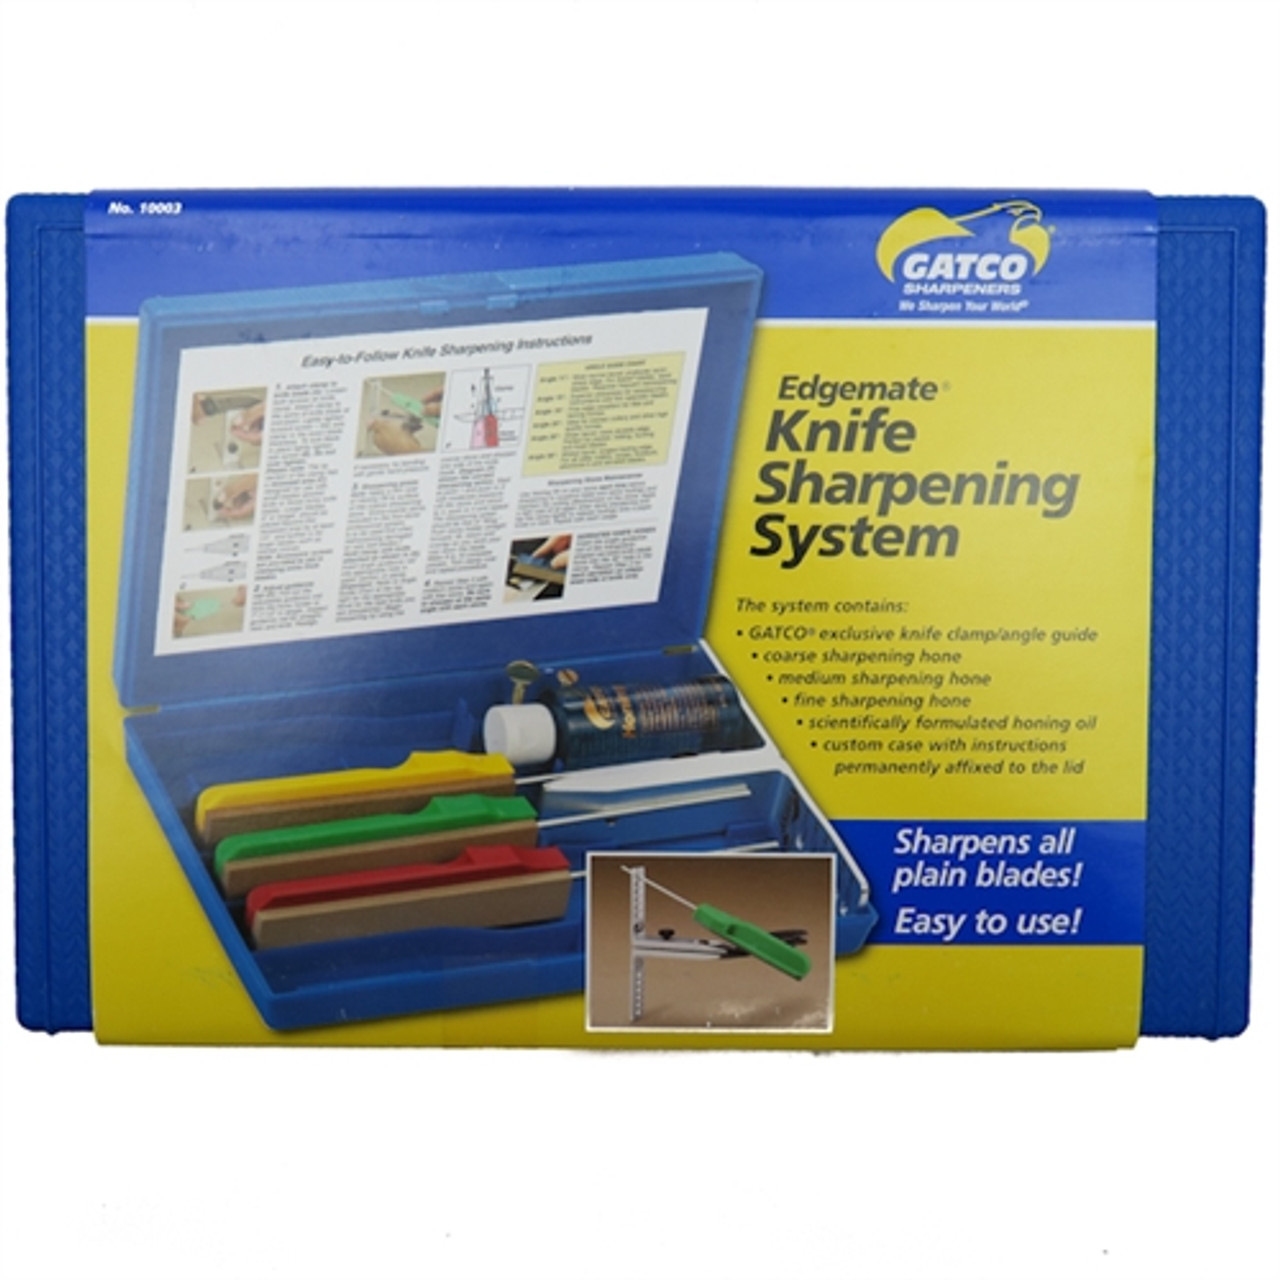 Gatco 10003 Edgemate Knife Sharpening System, 3 Hones